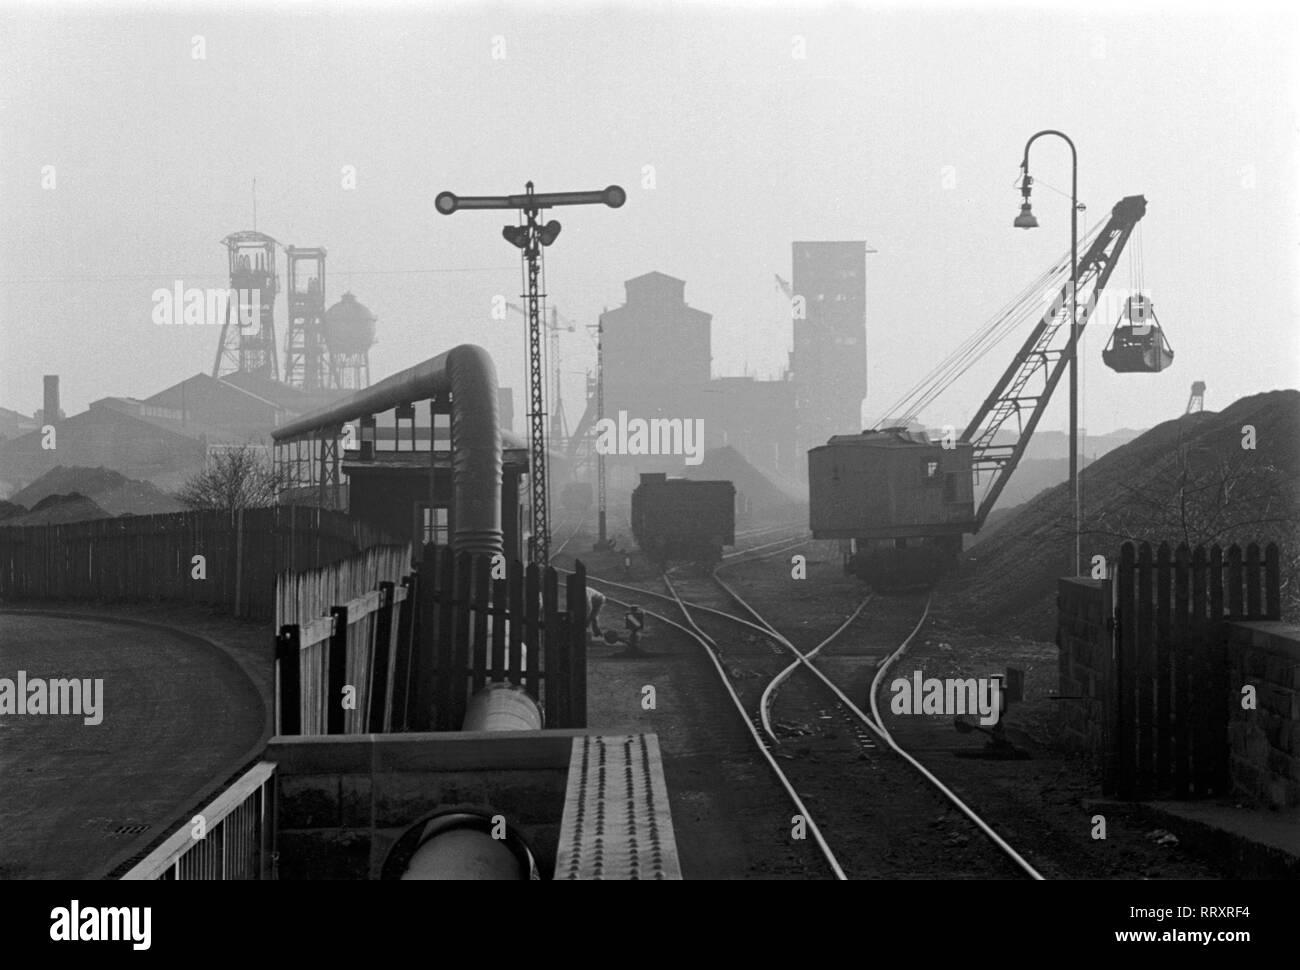 Germany - Deutschland ca. 1950, Ruhrgebiet, Bergwerk bei Kamen. - Stock Image